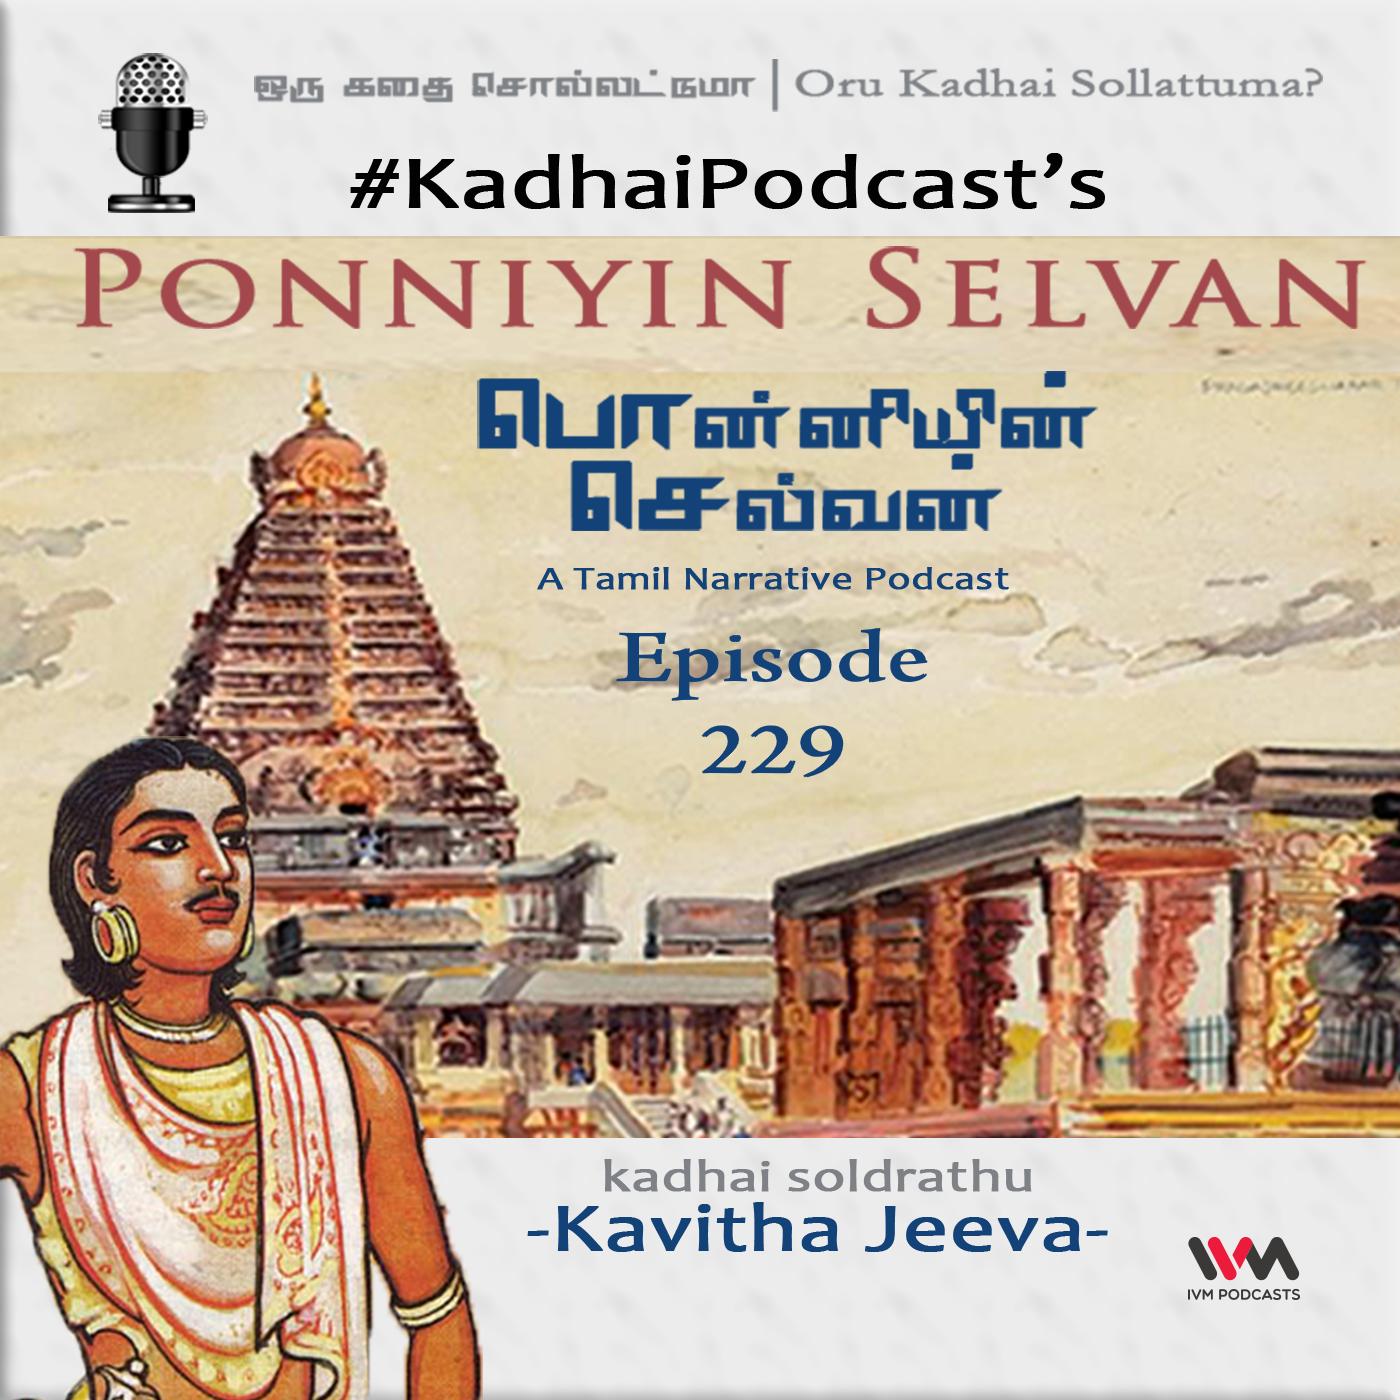 KadhaiPodcast's Ponniyin Selvan - Episode # 229